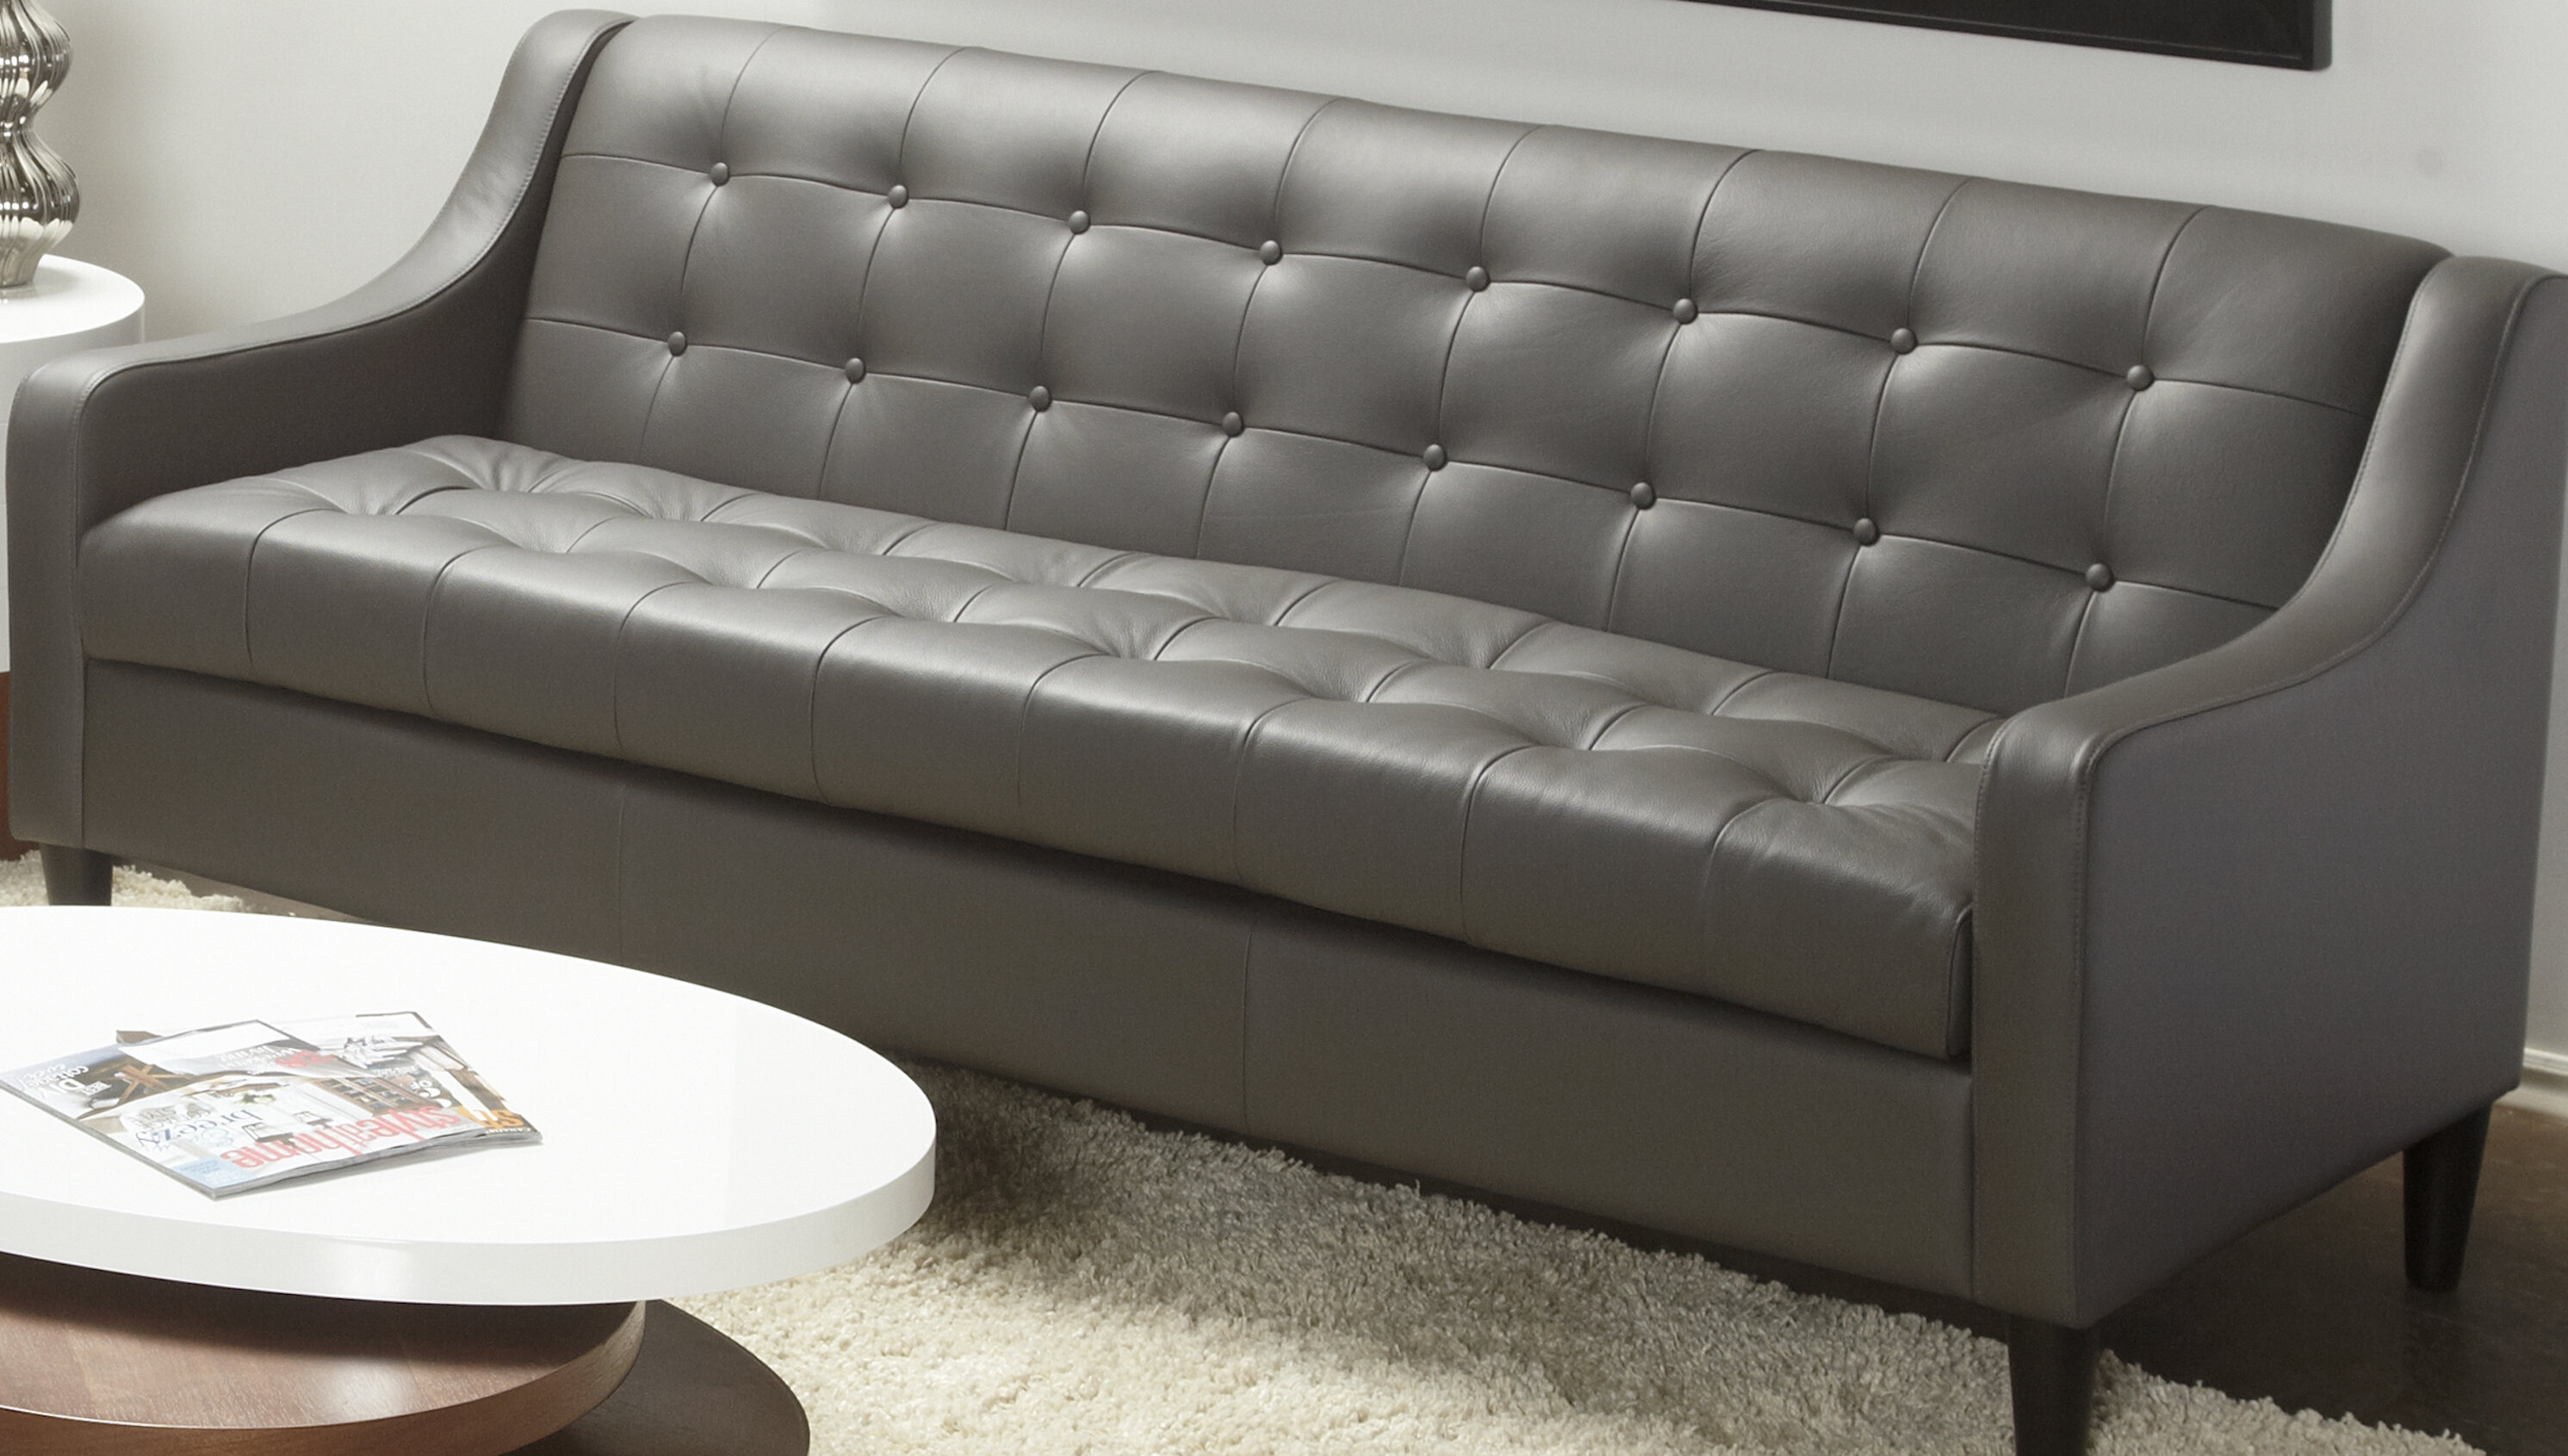 Lind Furniture Cameo Leather Sofa & Reviews | Wayfair